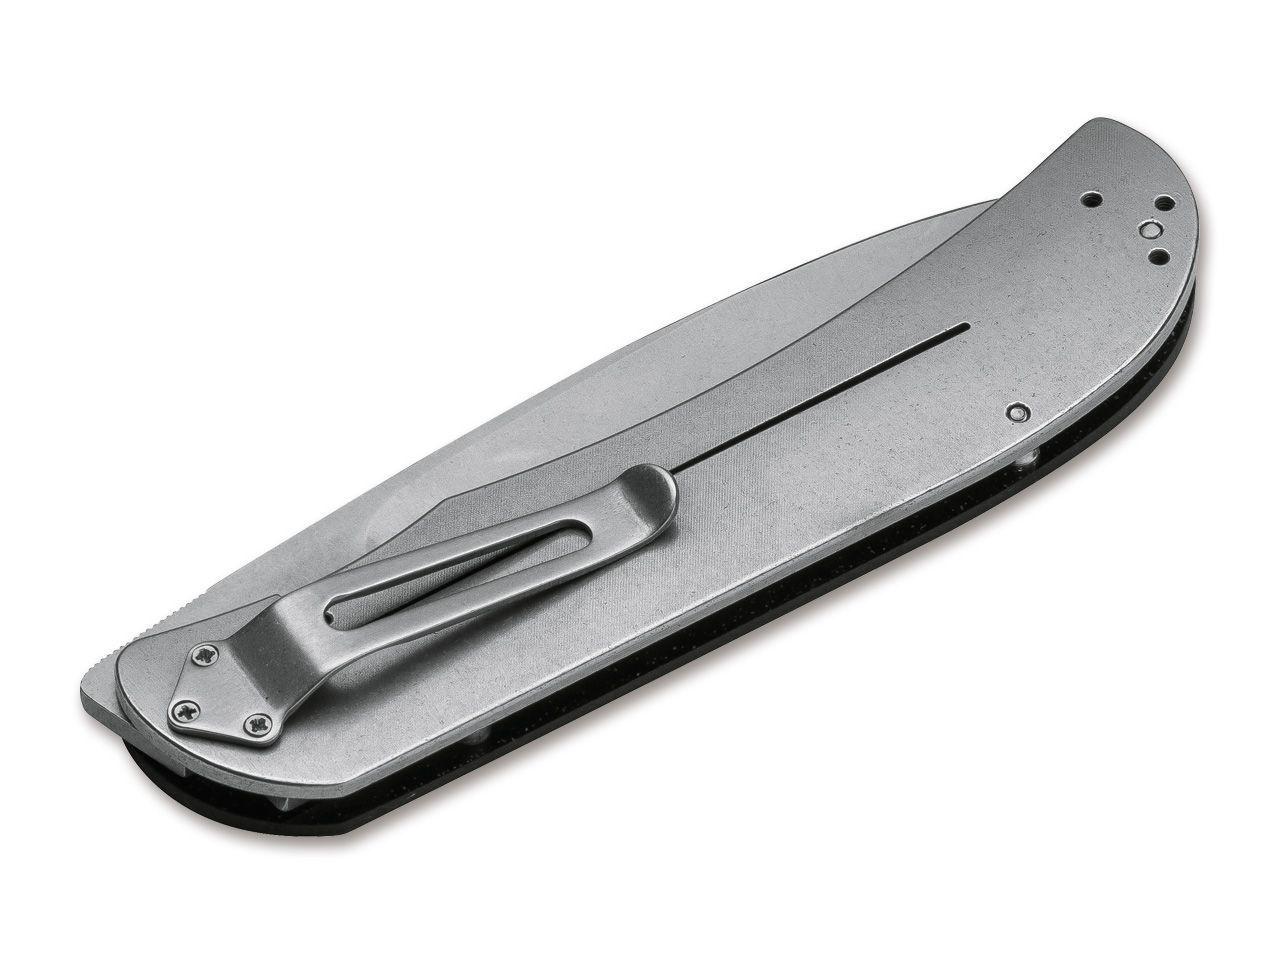 Фото 2 - Складной нож Boker Plus Exskelibur 1, лезвие Stonewashed D2 Tool Steel, Black G-10 рукоять, 01BO137